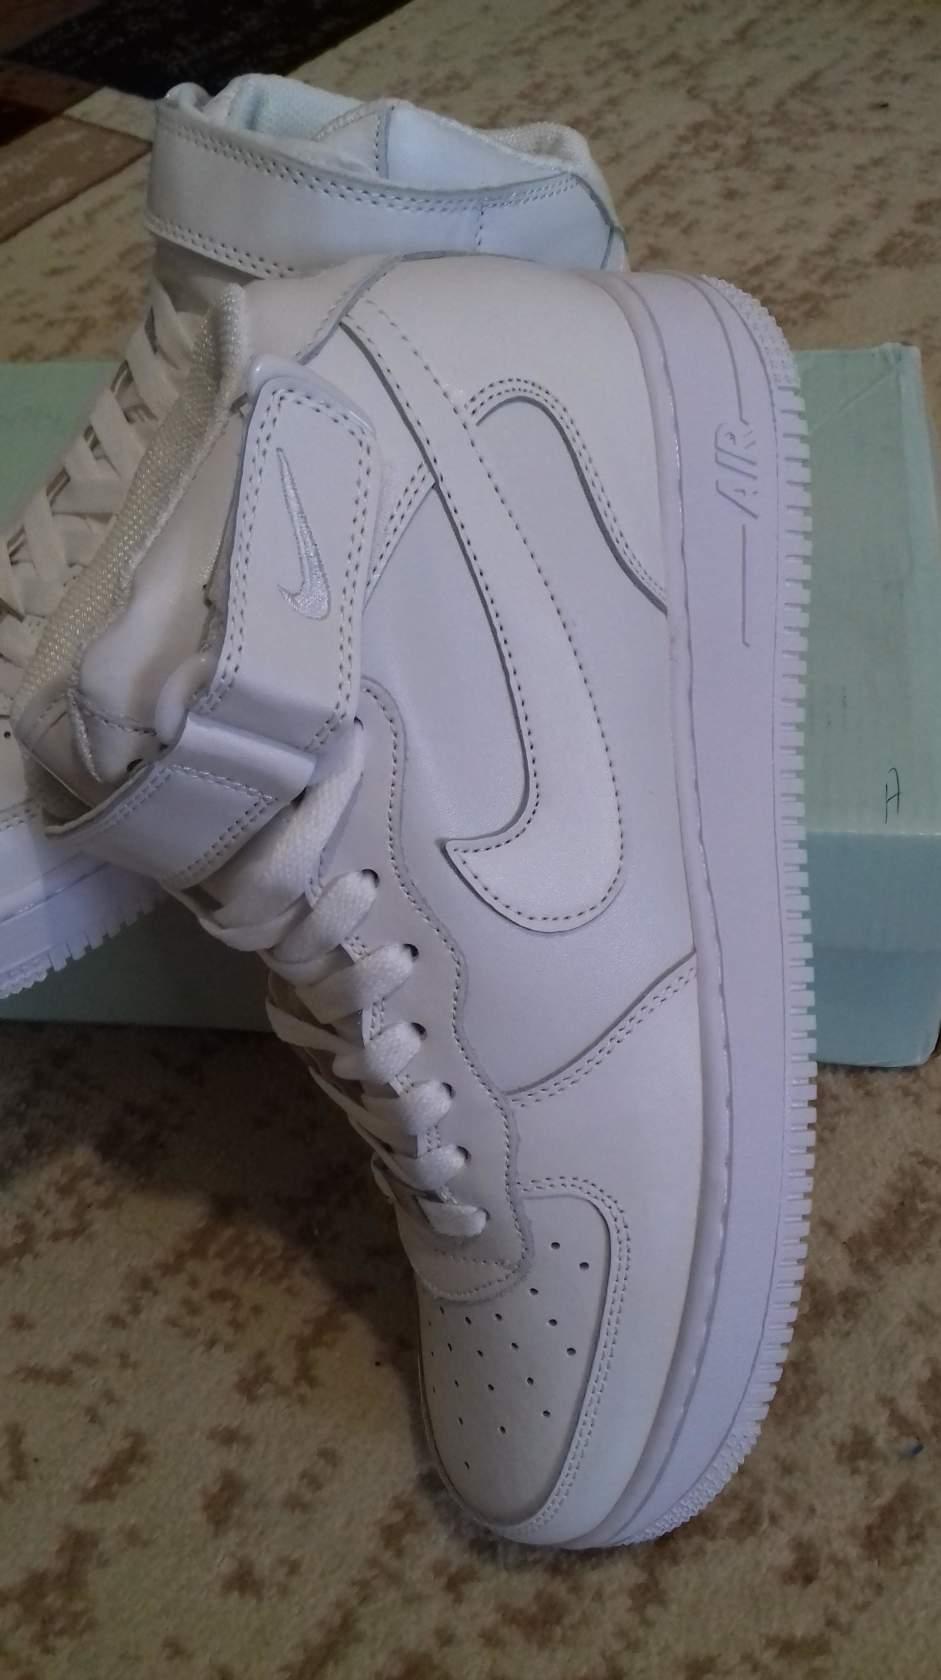 e5baeb2f продаю кроссовки , новые оригинал , Nike Air Force 1 ,белый верх кожа  внутри текстиль , размер 43 , унисекс, покупали без меня в Москве размер не  подошёл ...